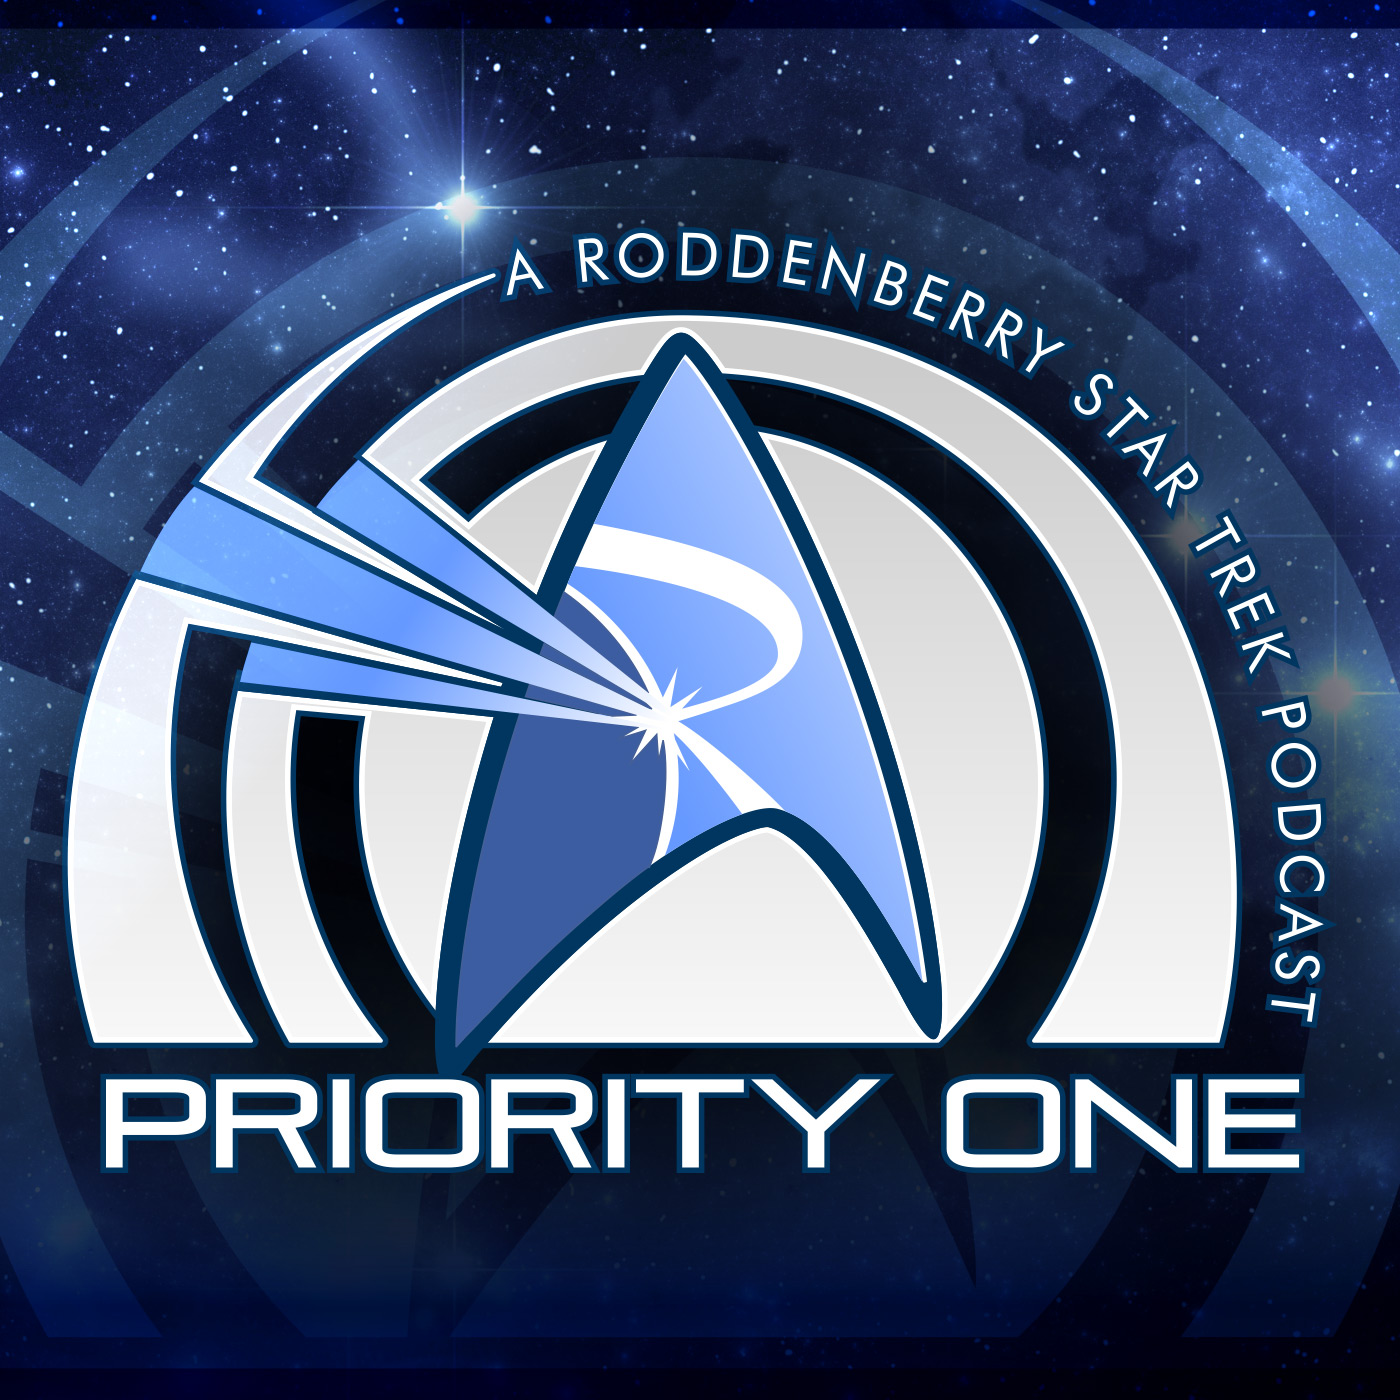 Priority One: A Roddenberry Star Trek Podcast show art